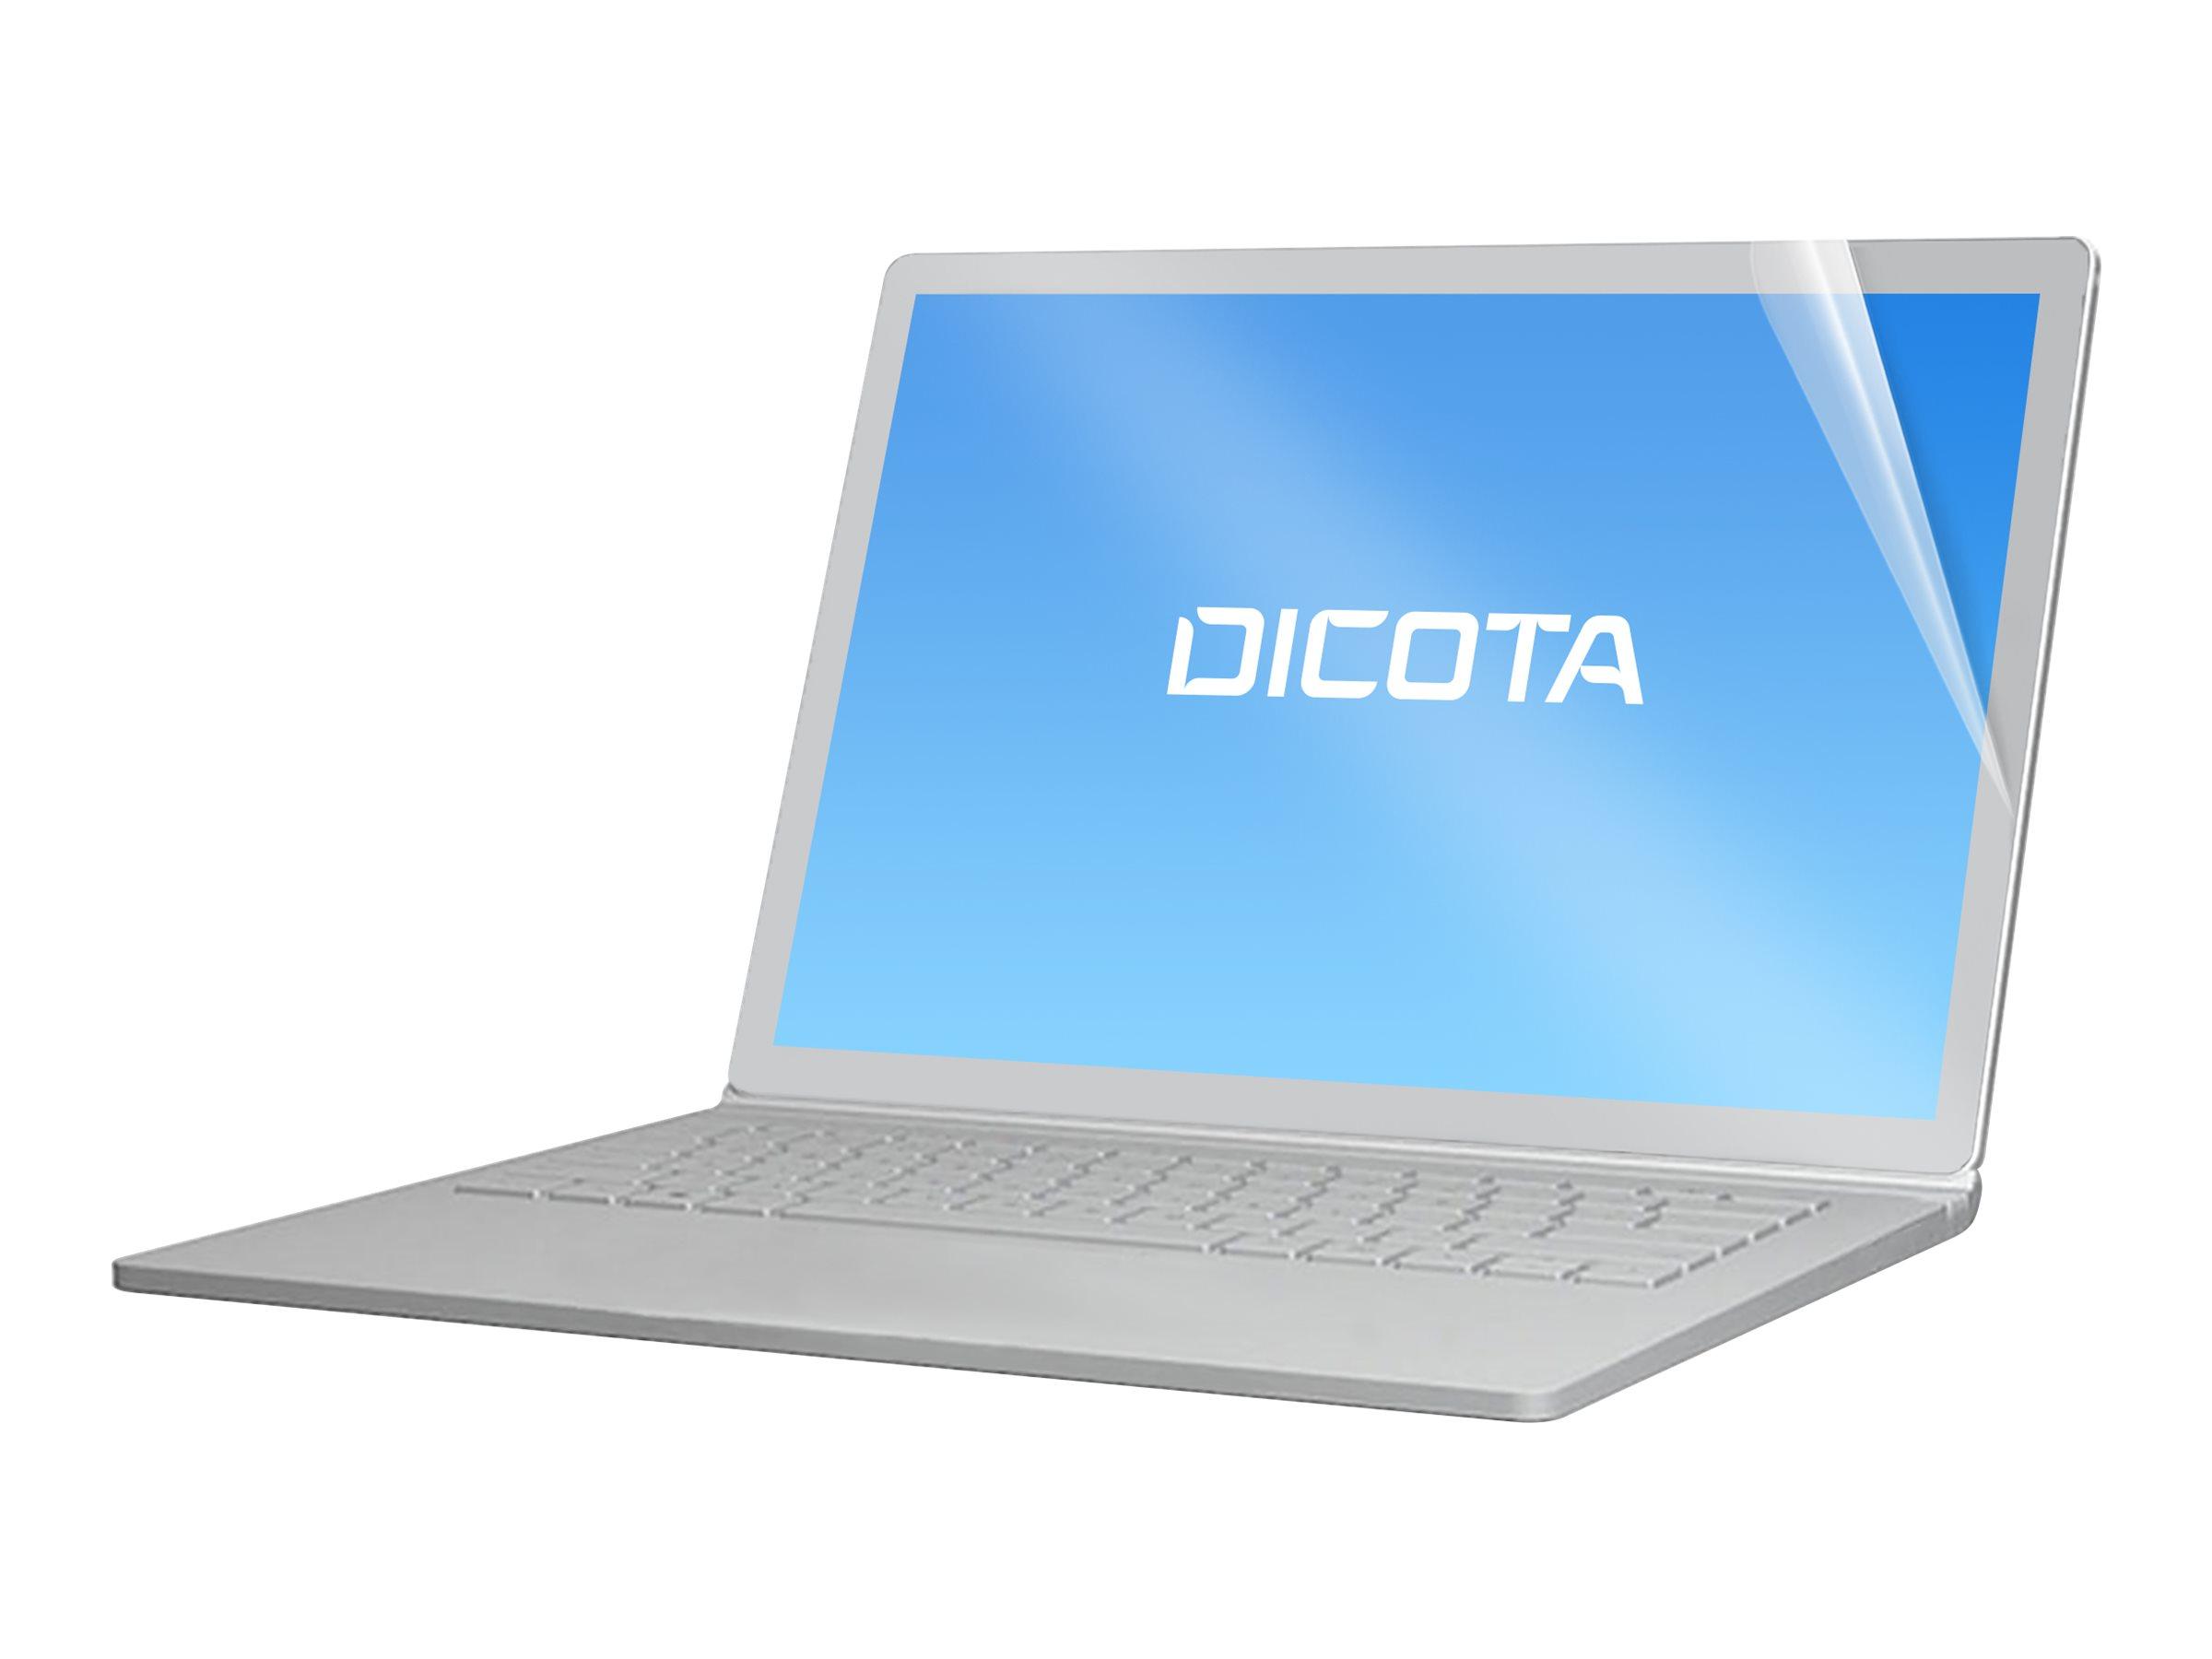 "Vorschau: Dicota Anti-Glare Filter 9H - Blendfreier Notebook-Filter - 34.3 cm (13.5"")"